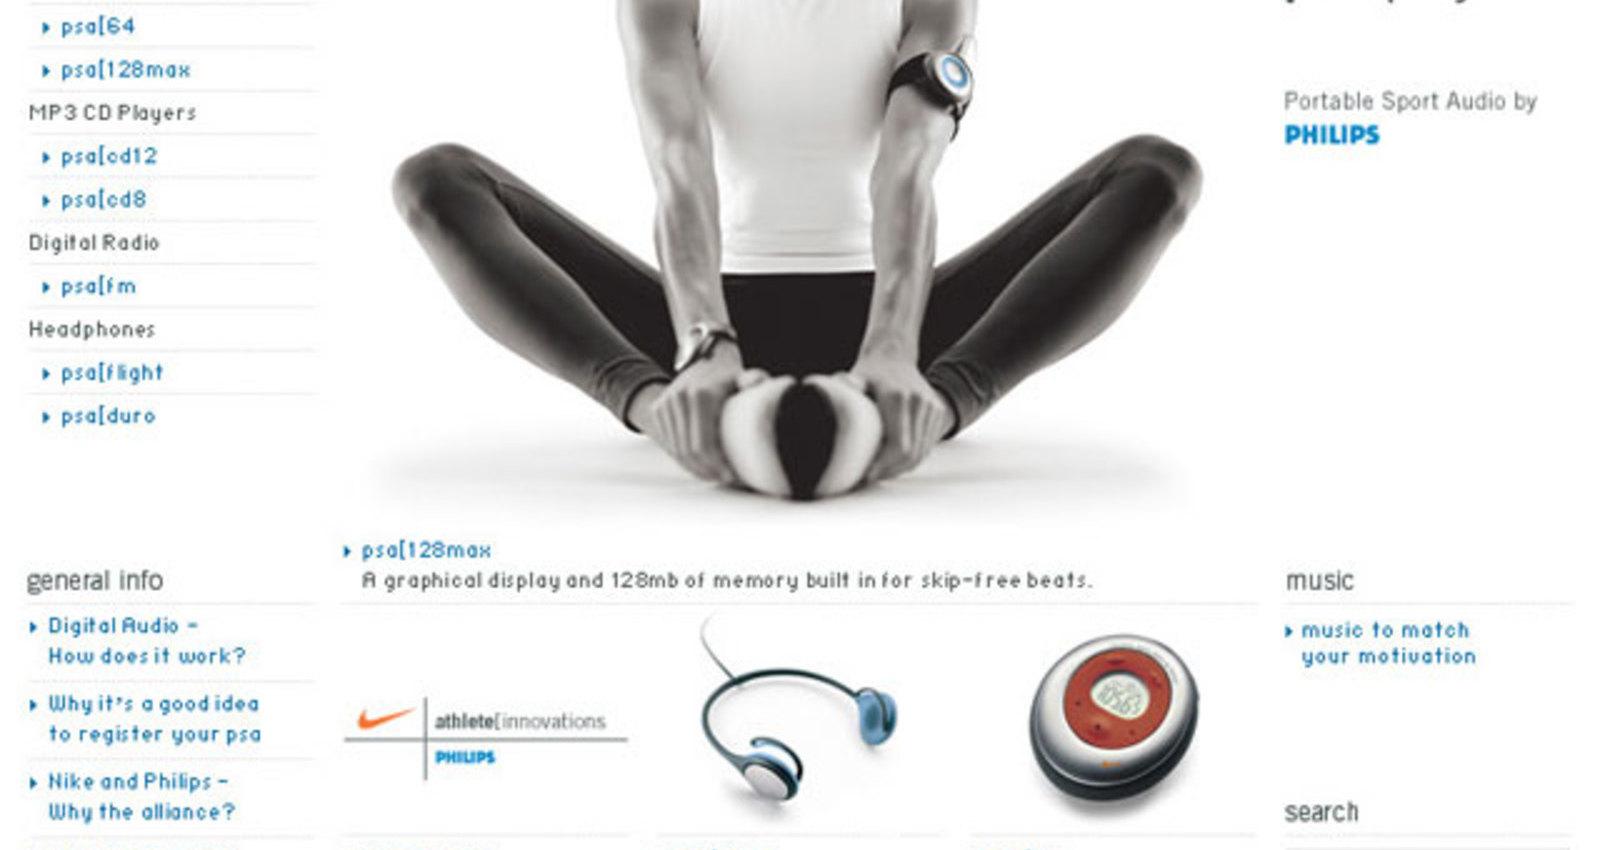 Nike-Philips.com